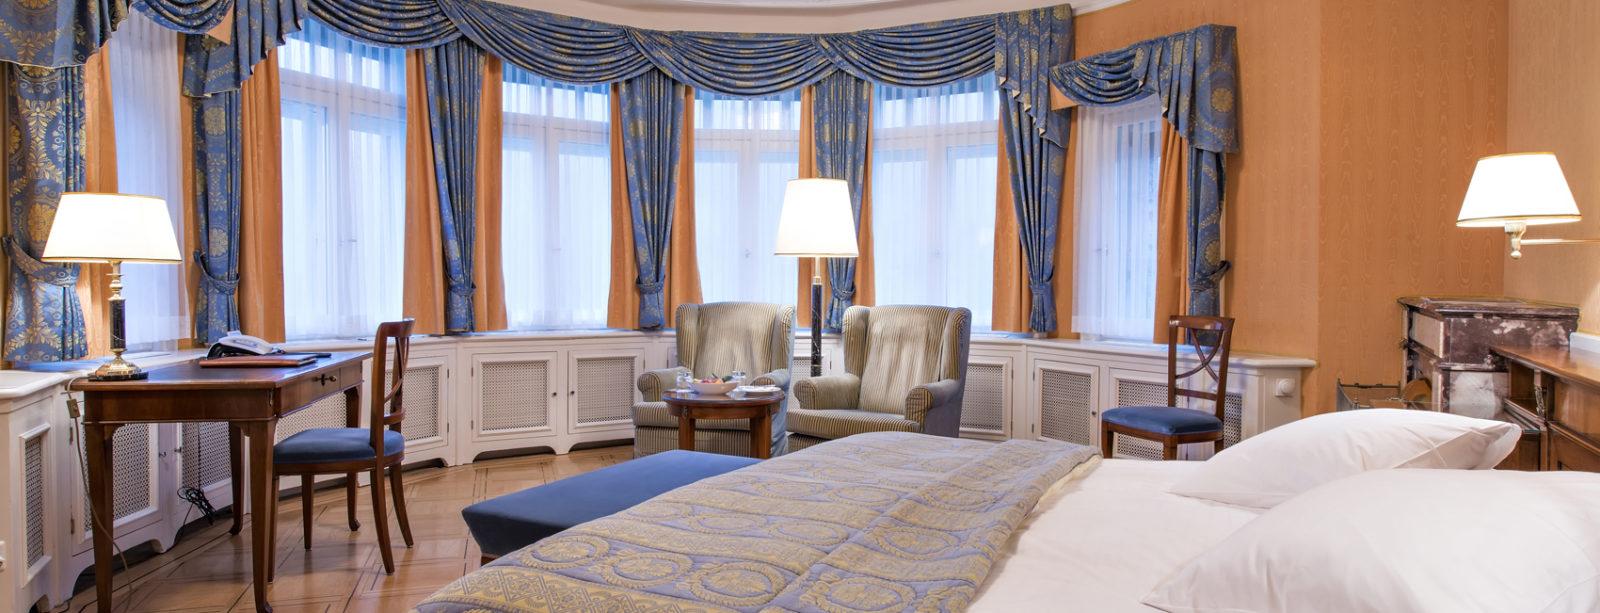 Chambres hotel waldhaus sils maria for Modernes waldhaus